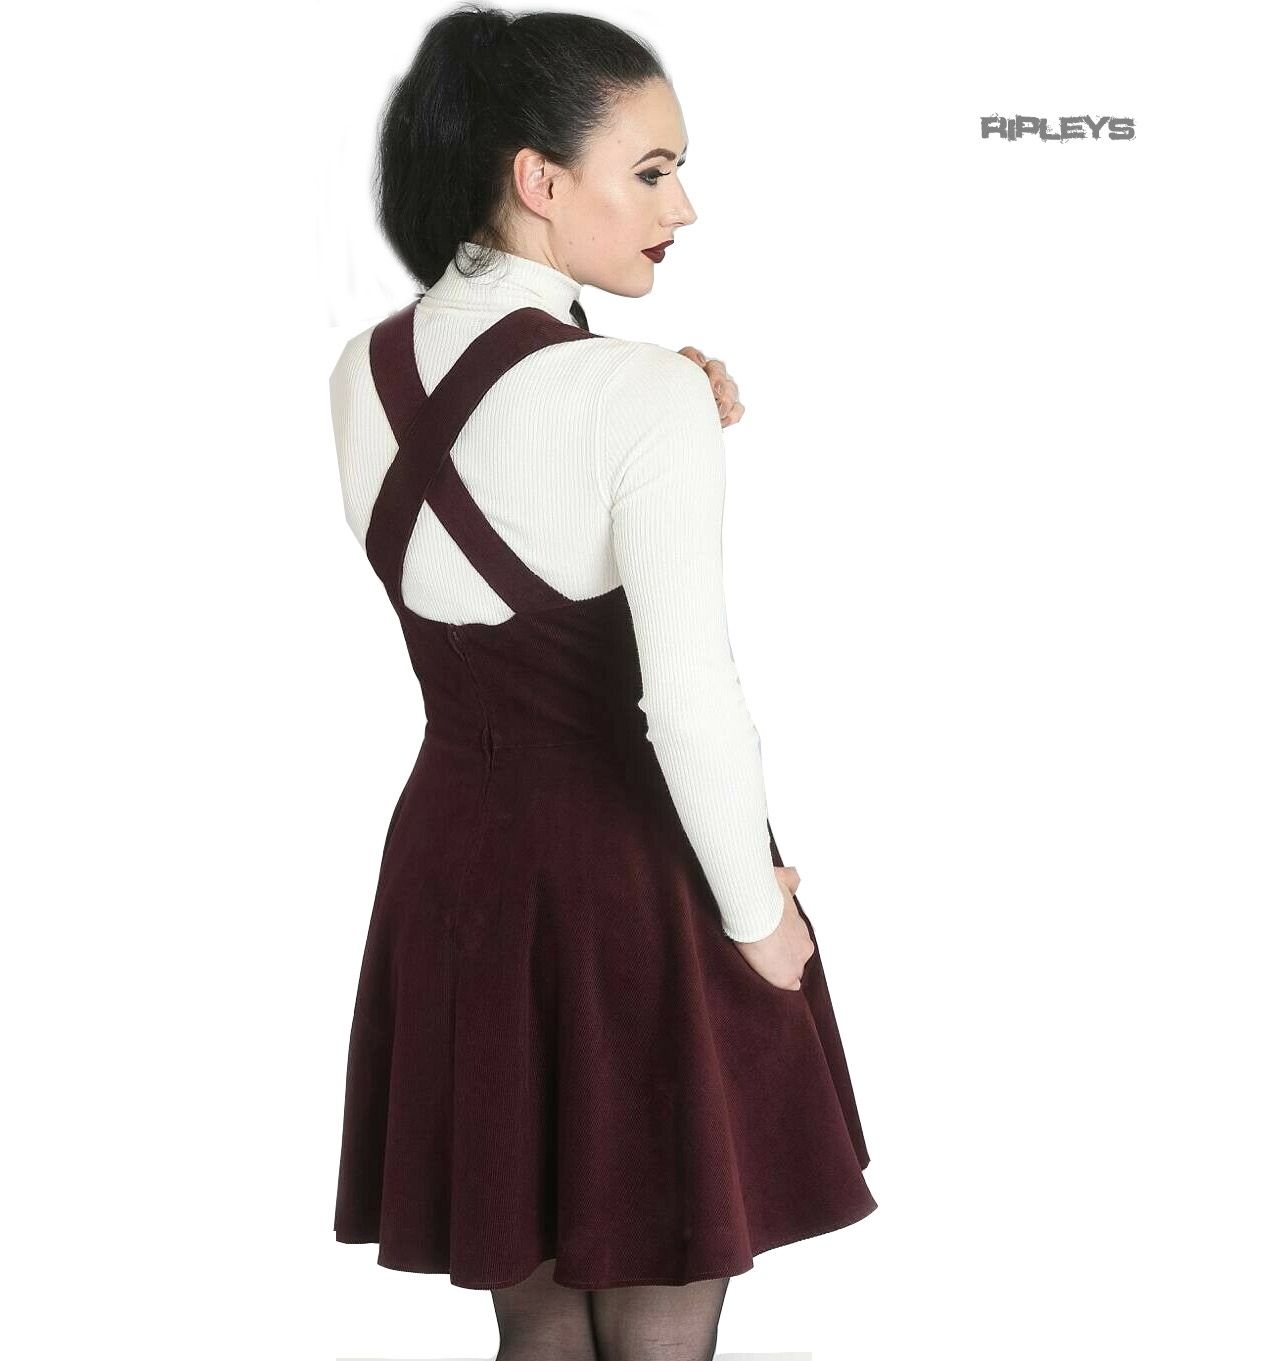 Hell-Bunny-Rockabilly-Corduroy-Mini-Dress-WONDER-YEARS-Pinafore-Wine-All-Sizes thumbnail 32